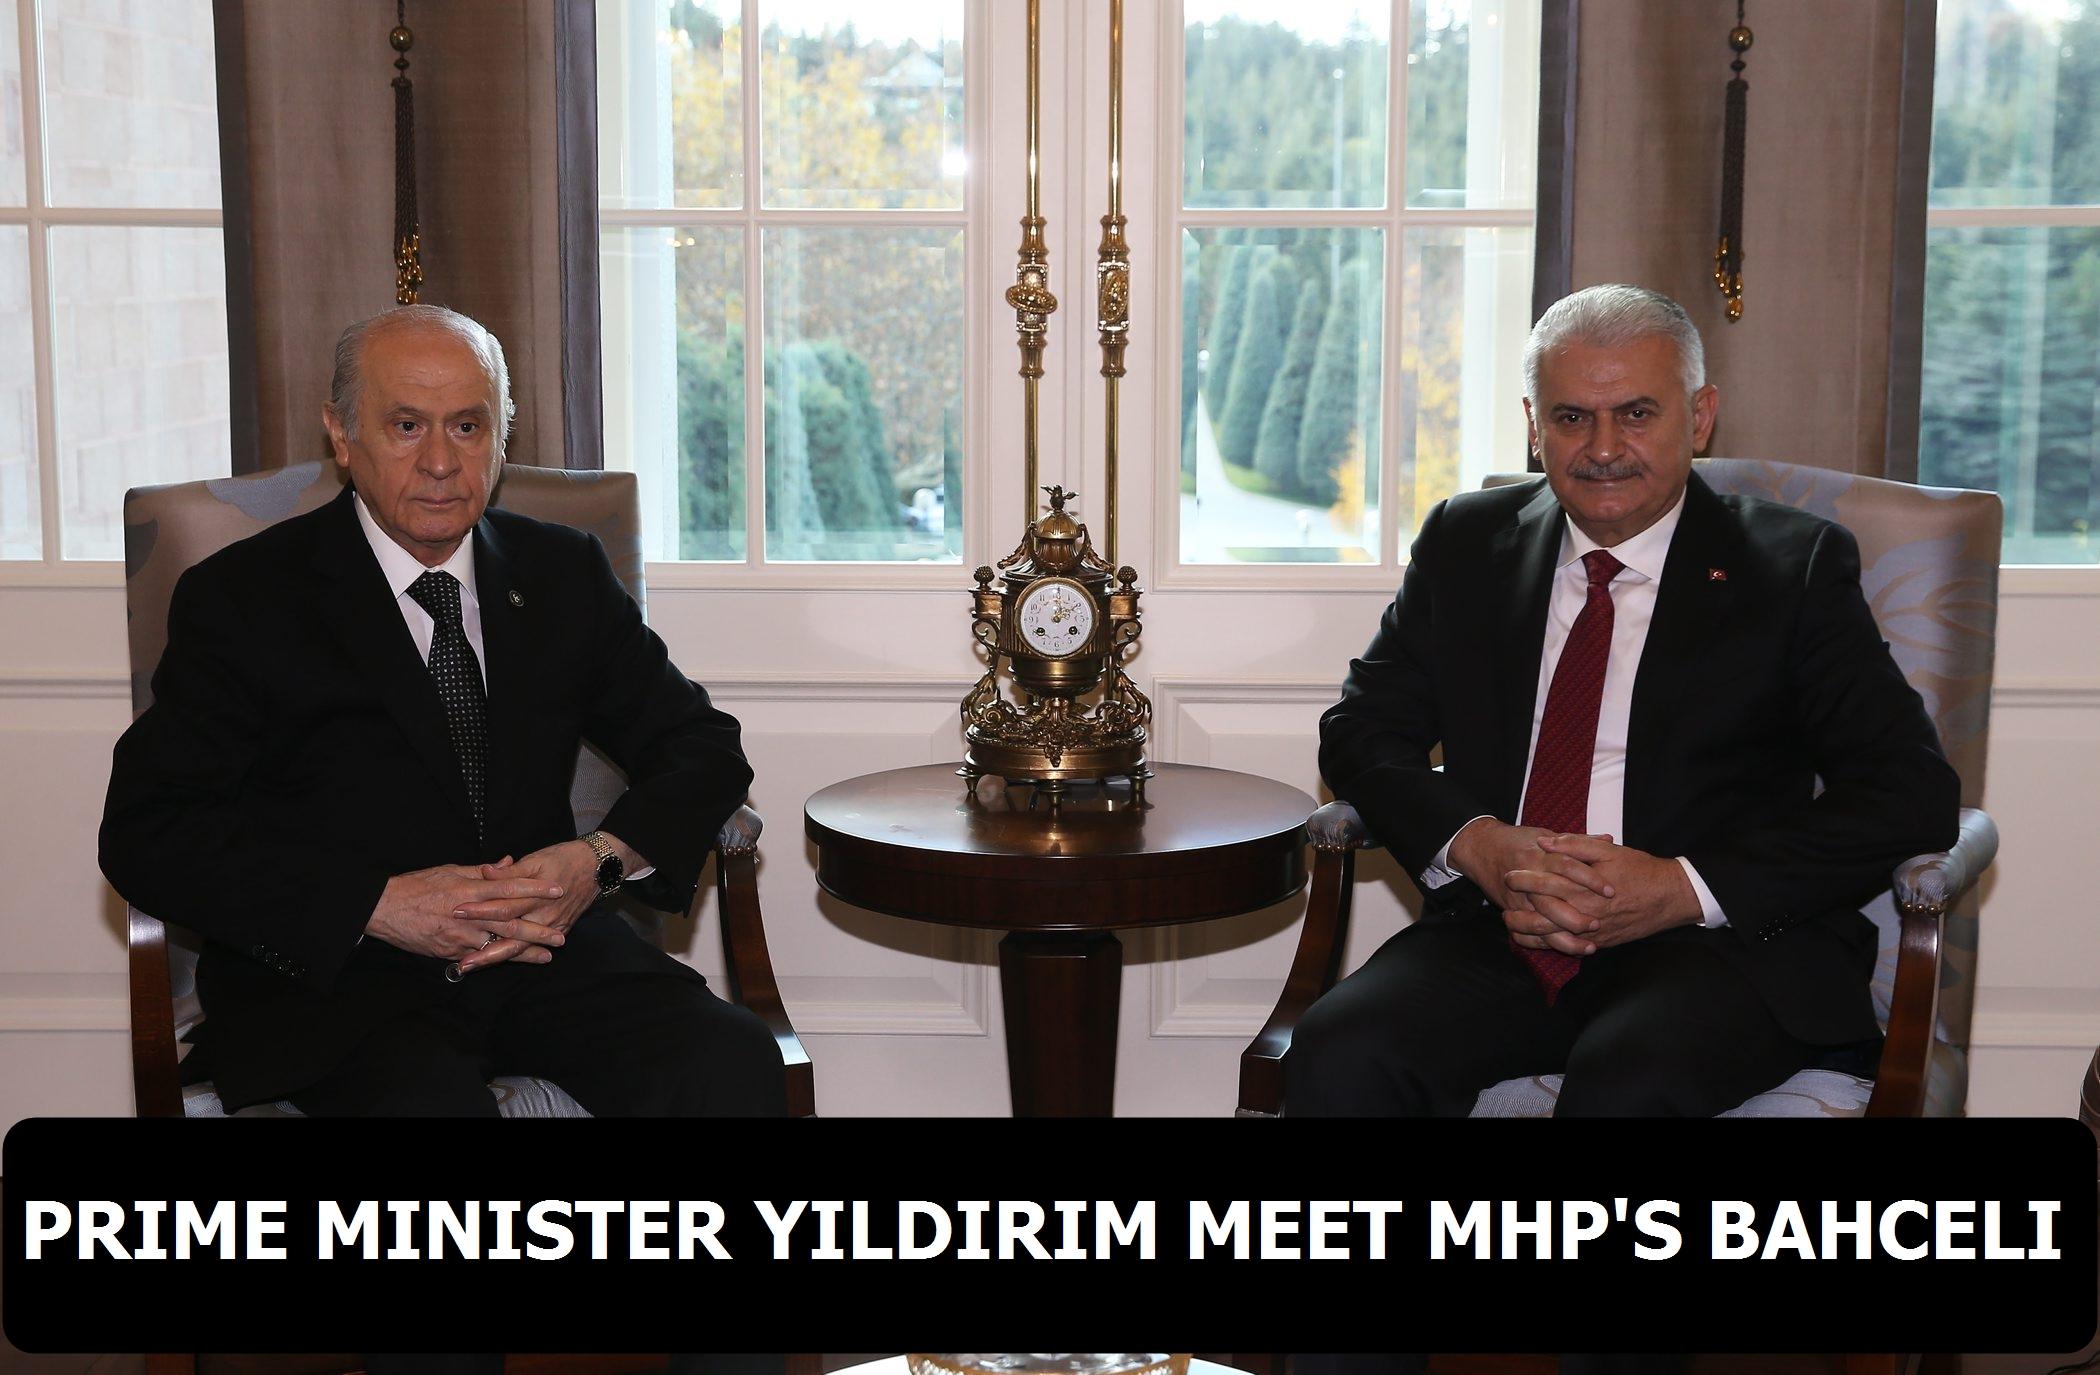 Prime Minister Yildirim meet MHP's Bahceli